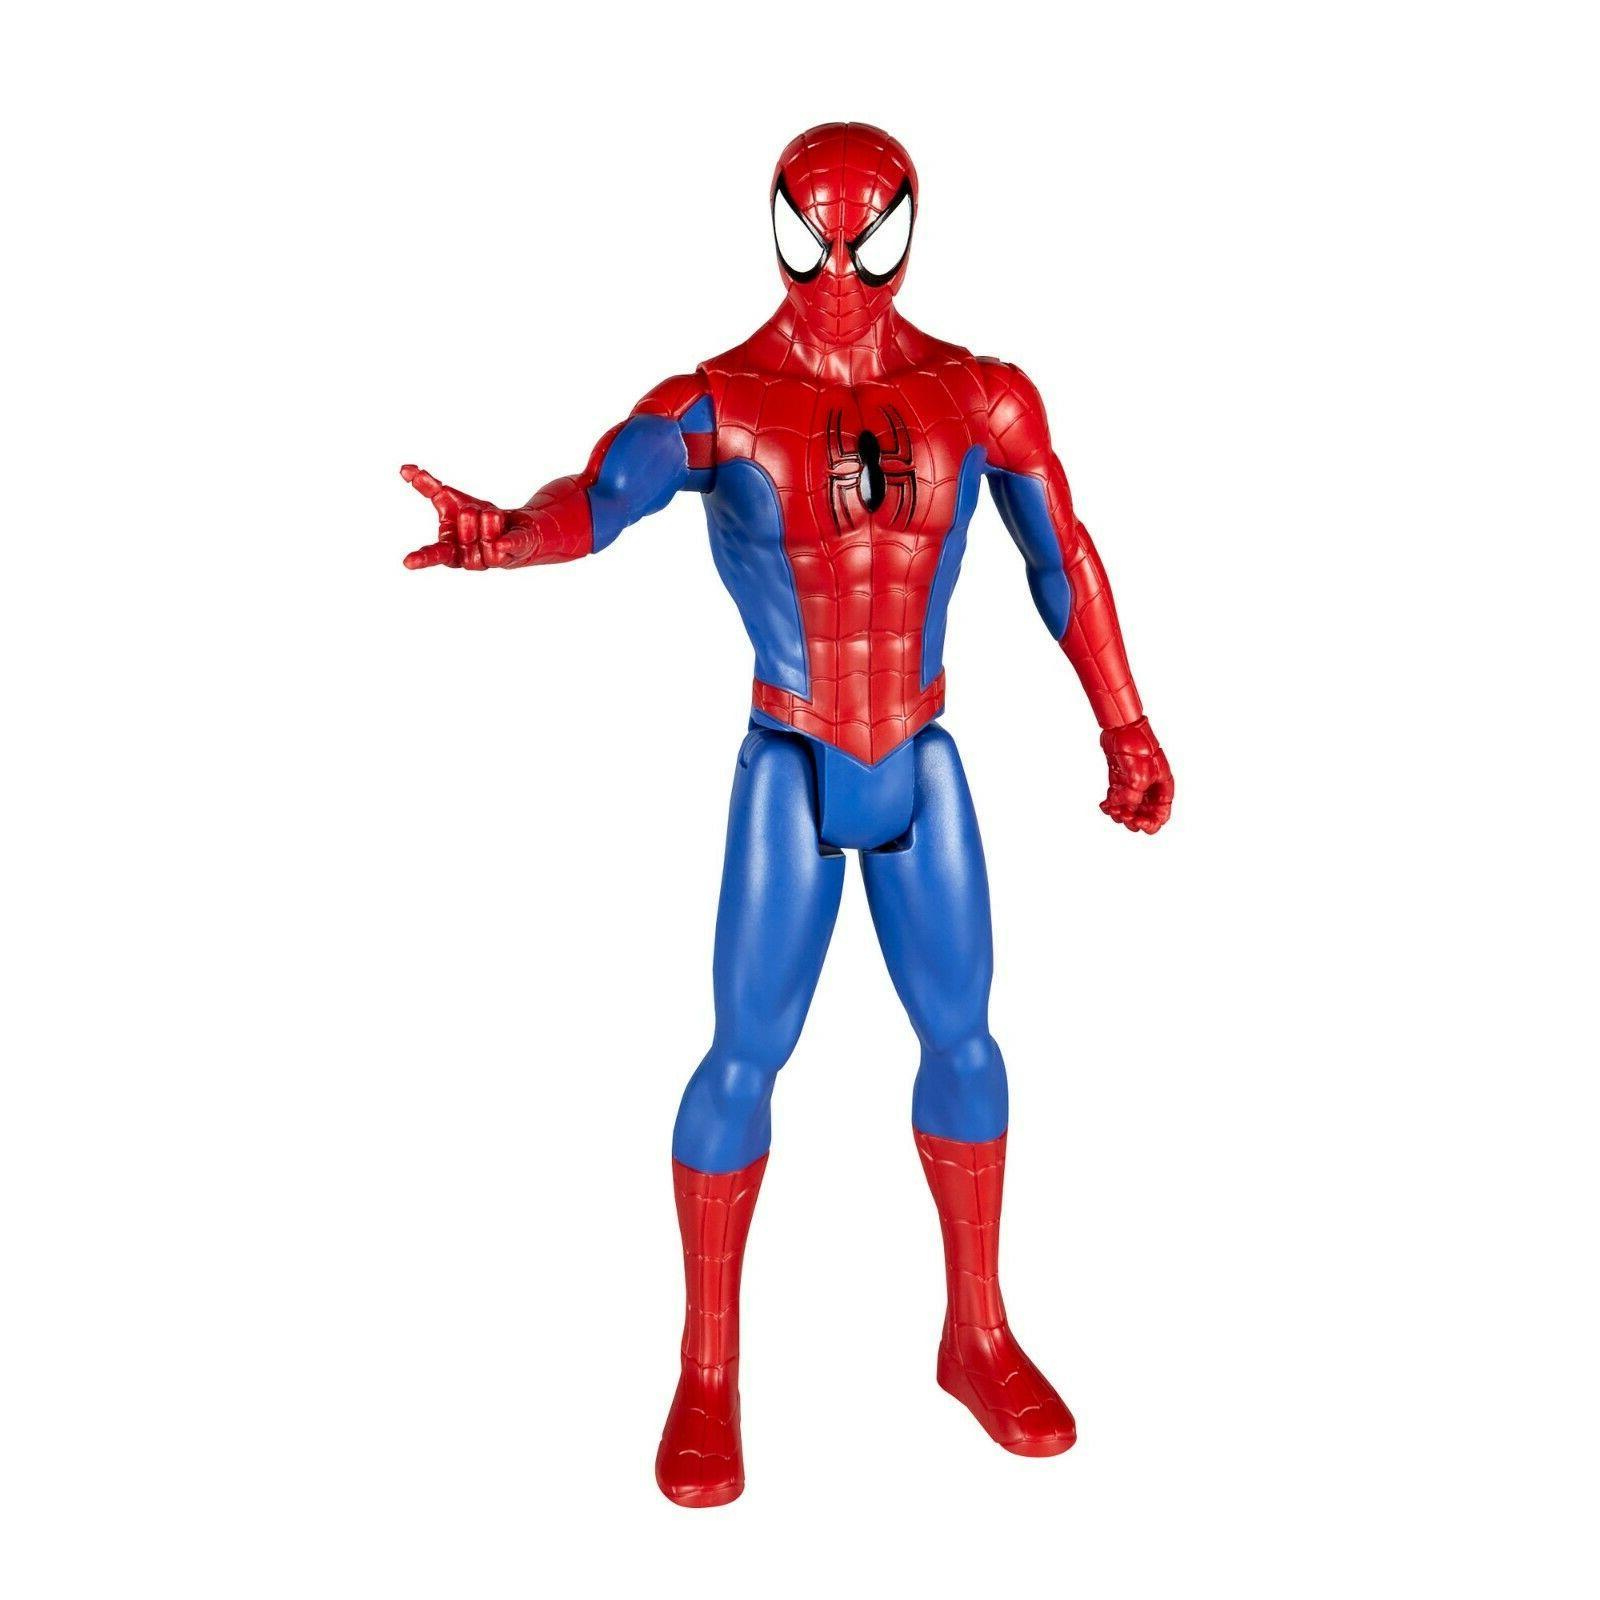 Spider-Man Titan Hero Figure with Power Fx Port E0649